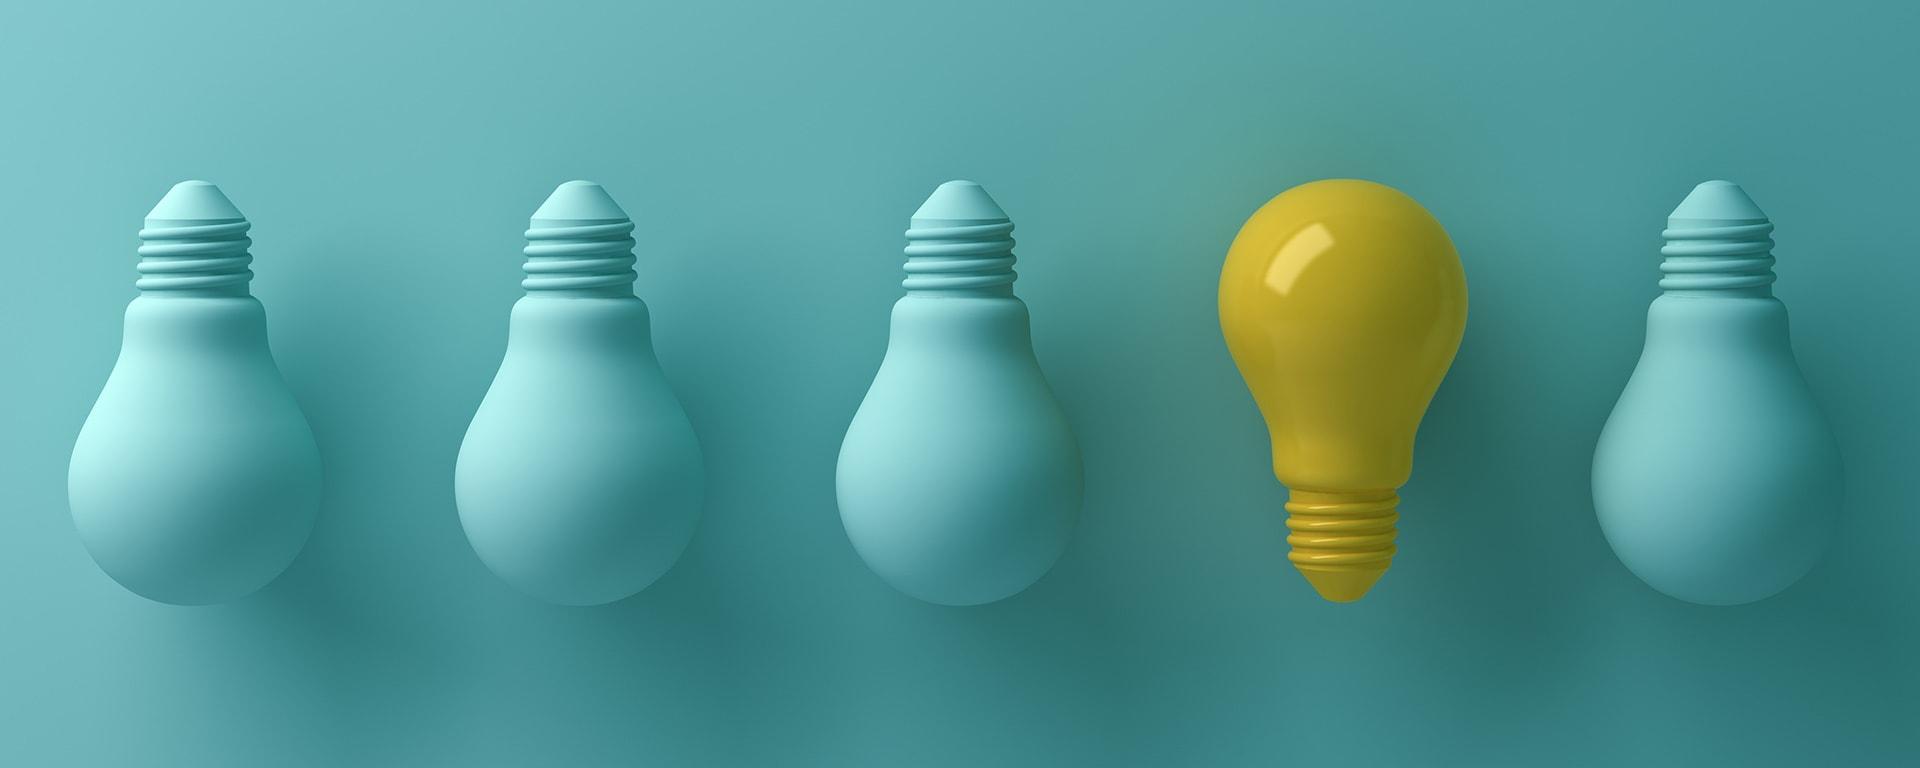 tactics for achieving bpm buy-in header image - lightbulbs